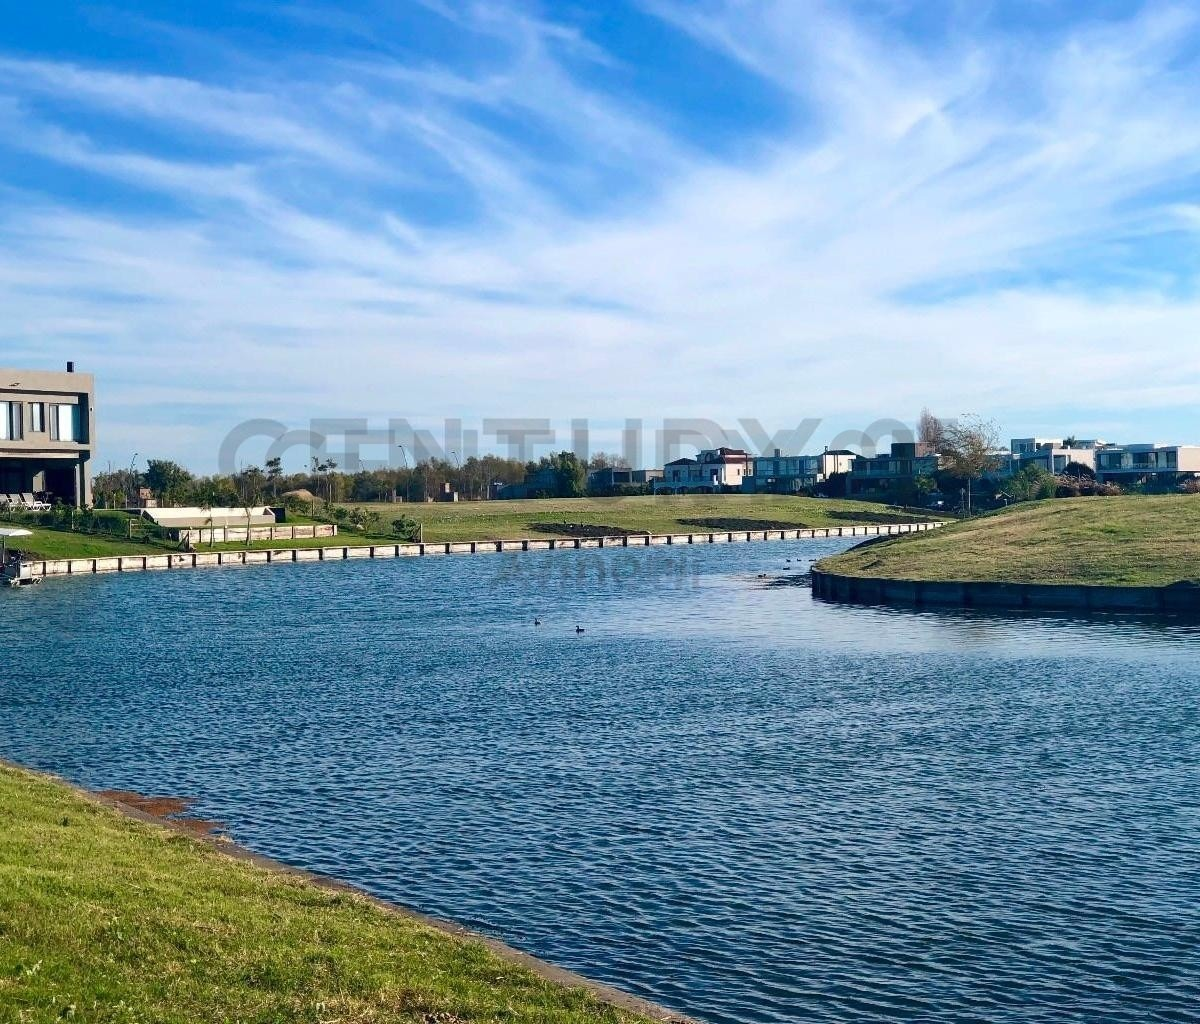 virazon nordelta - lotes en exclusiva al agua sobre lago central